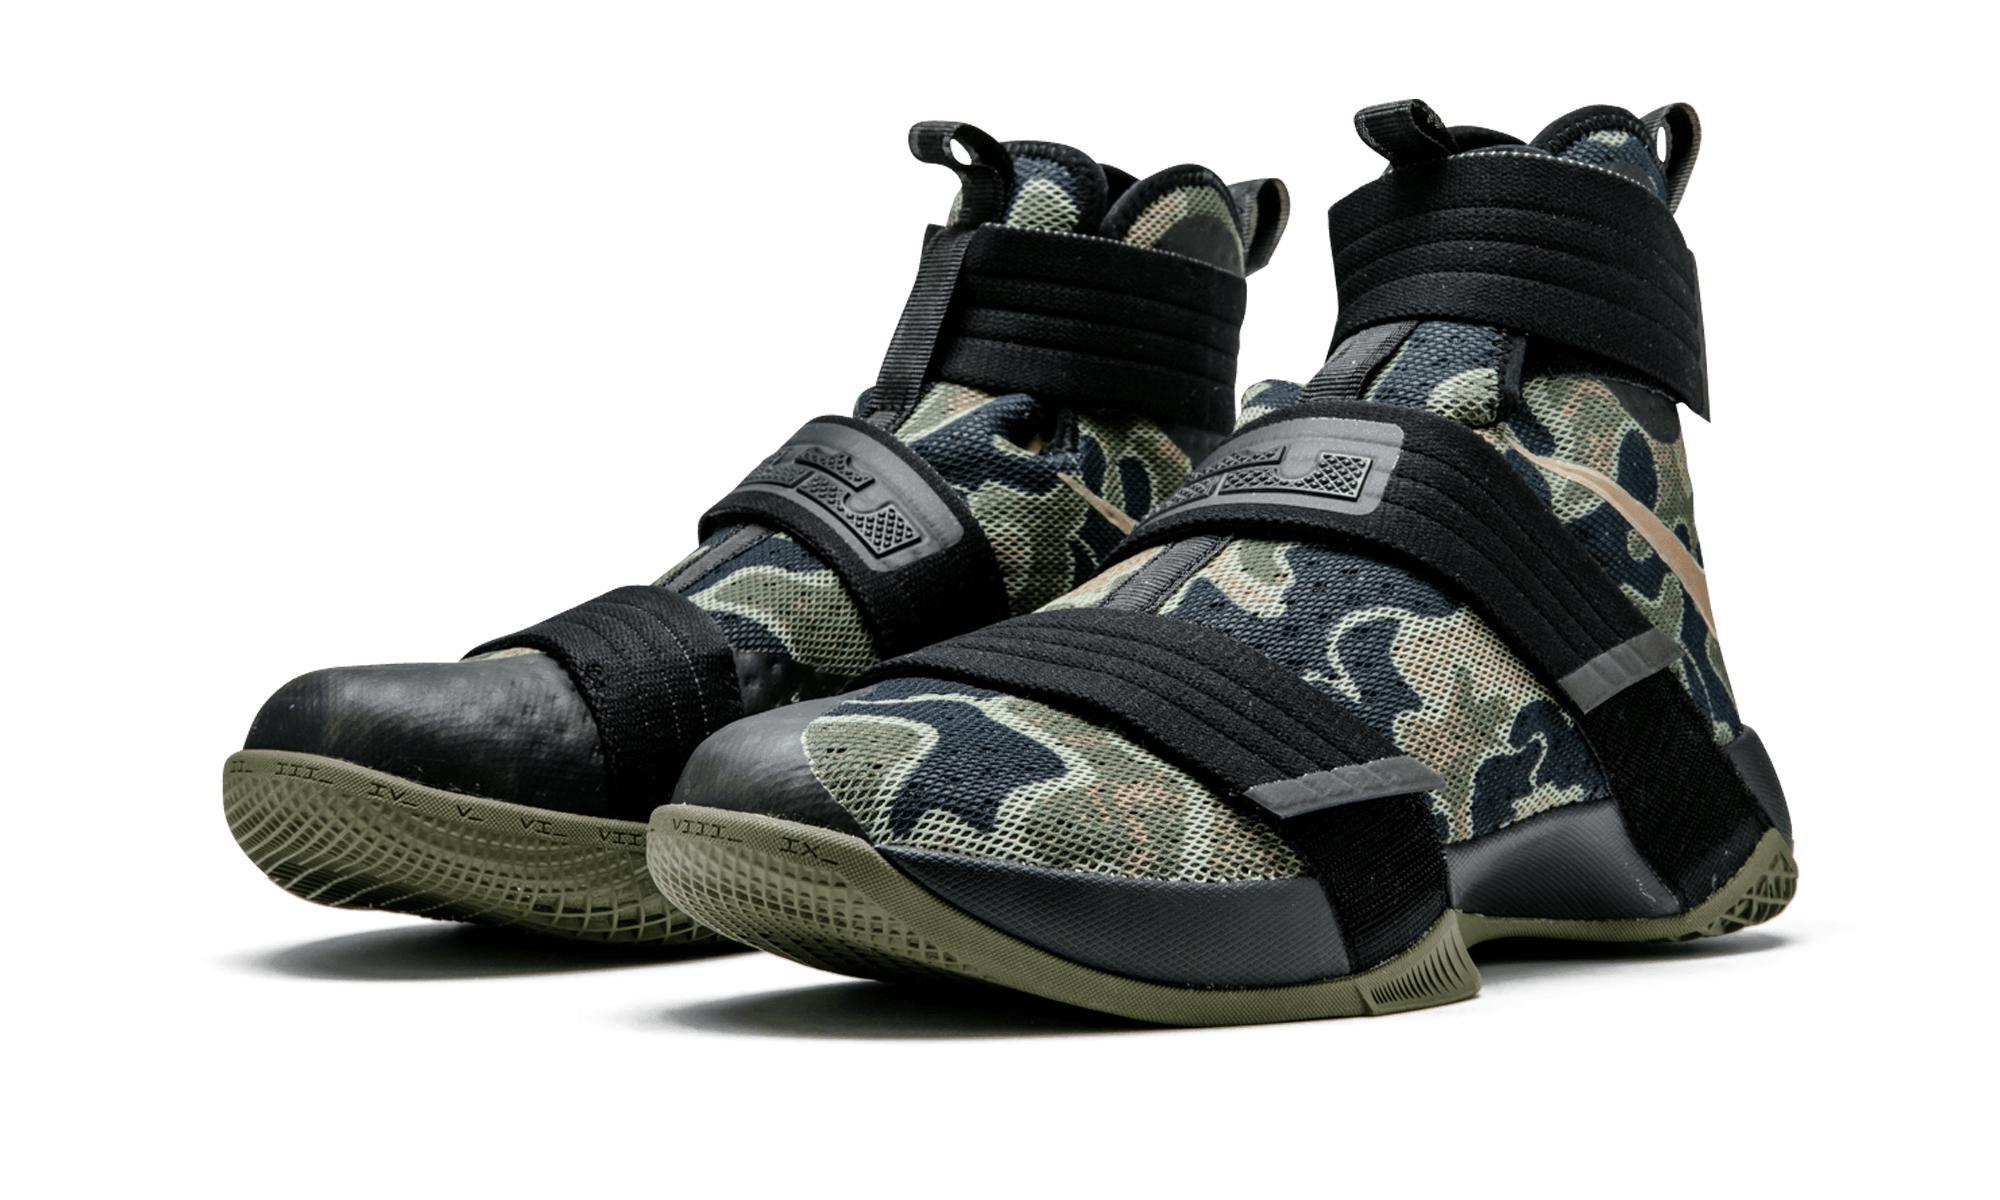 detailed look 476e4 c2d45 Nike Black Lebron Soldier 10 Sfg for men